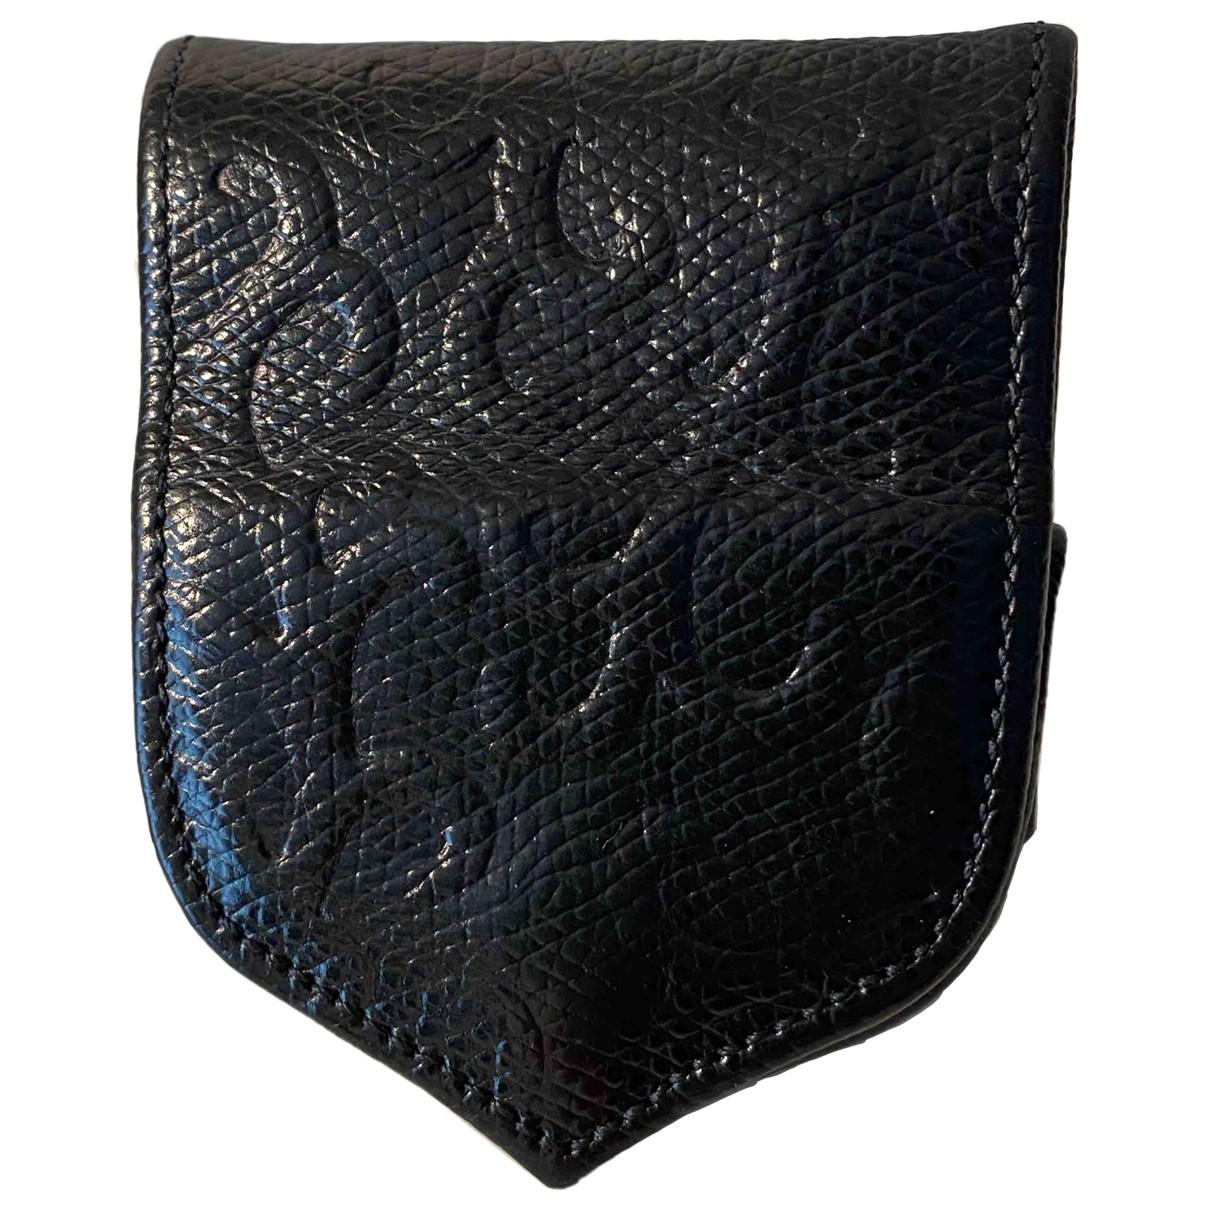 Yves Saint Laurent N Black Leather Purses, wallet & cases for Women N